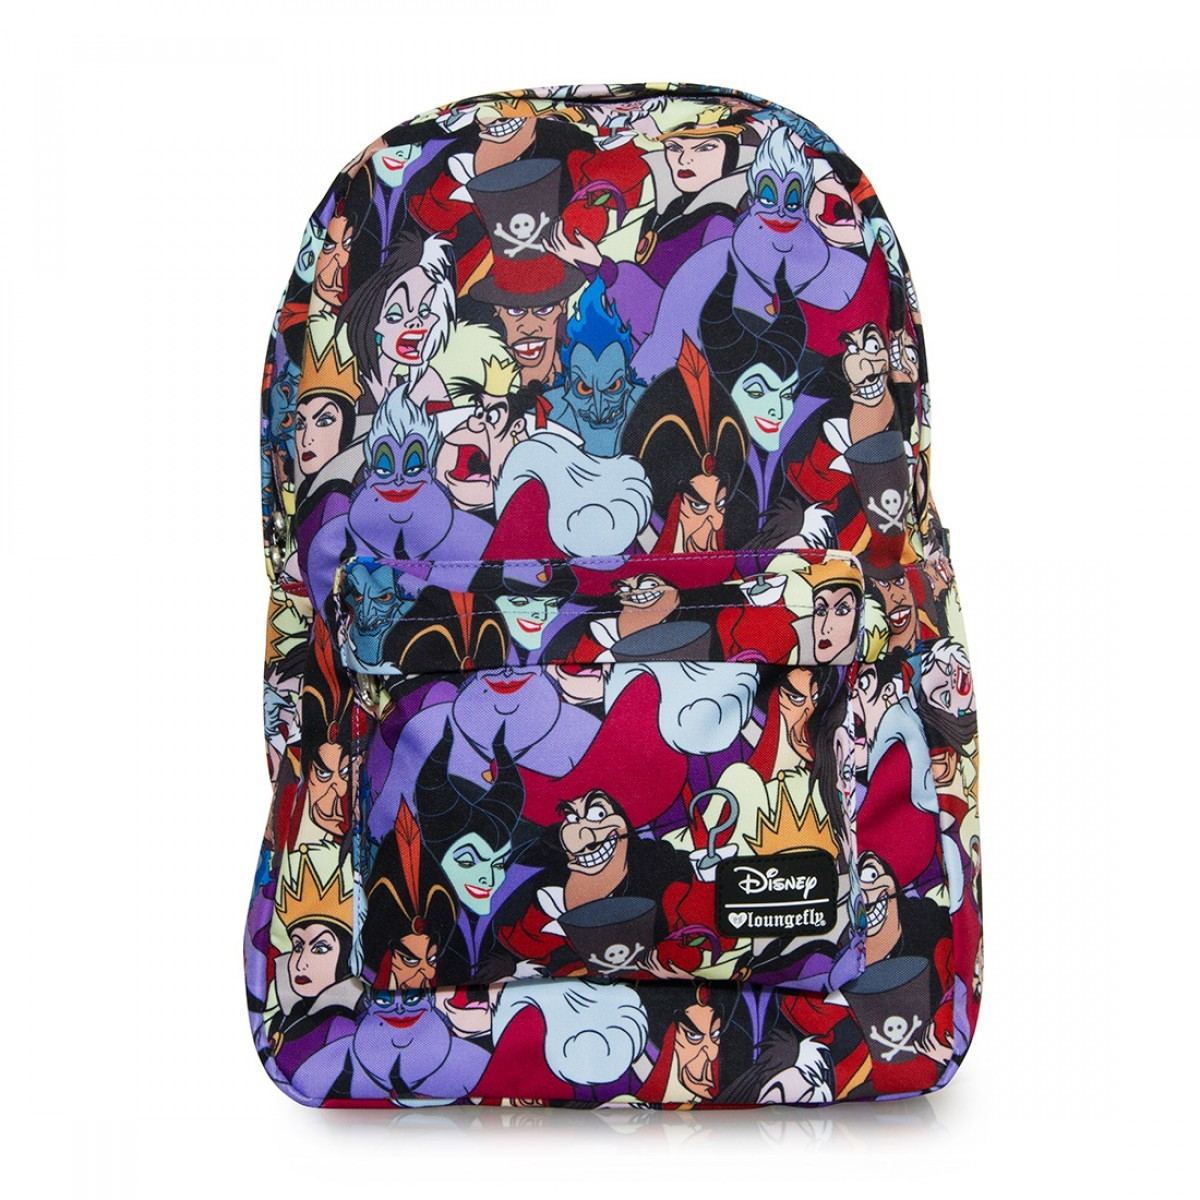 Loungefly Disney Villains Character Backpack image 8c5b88e6bda37